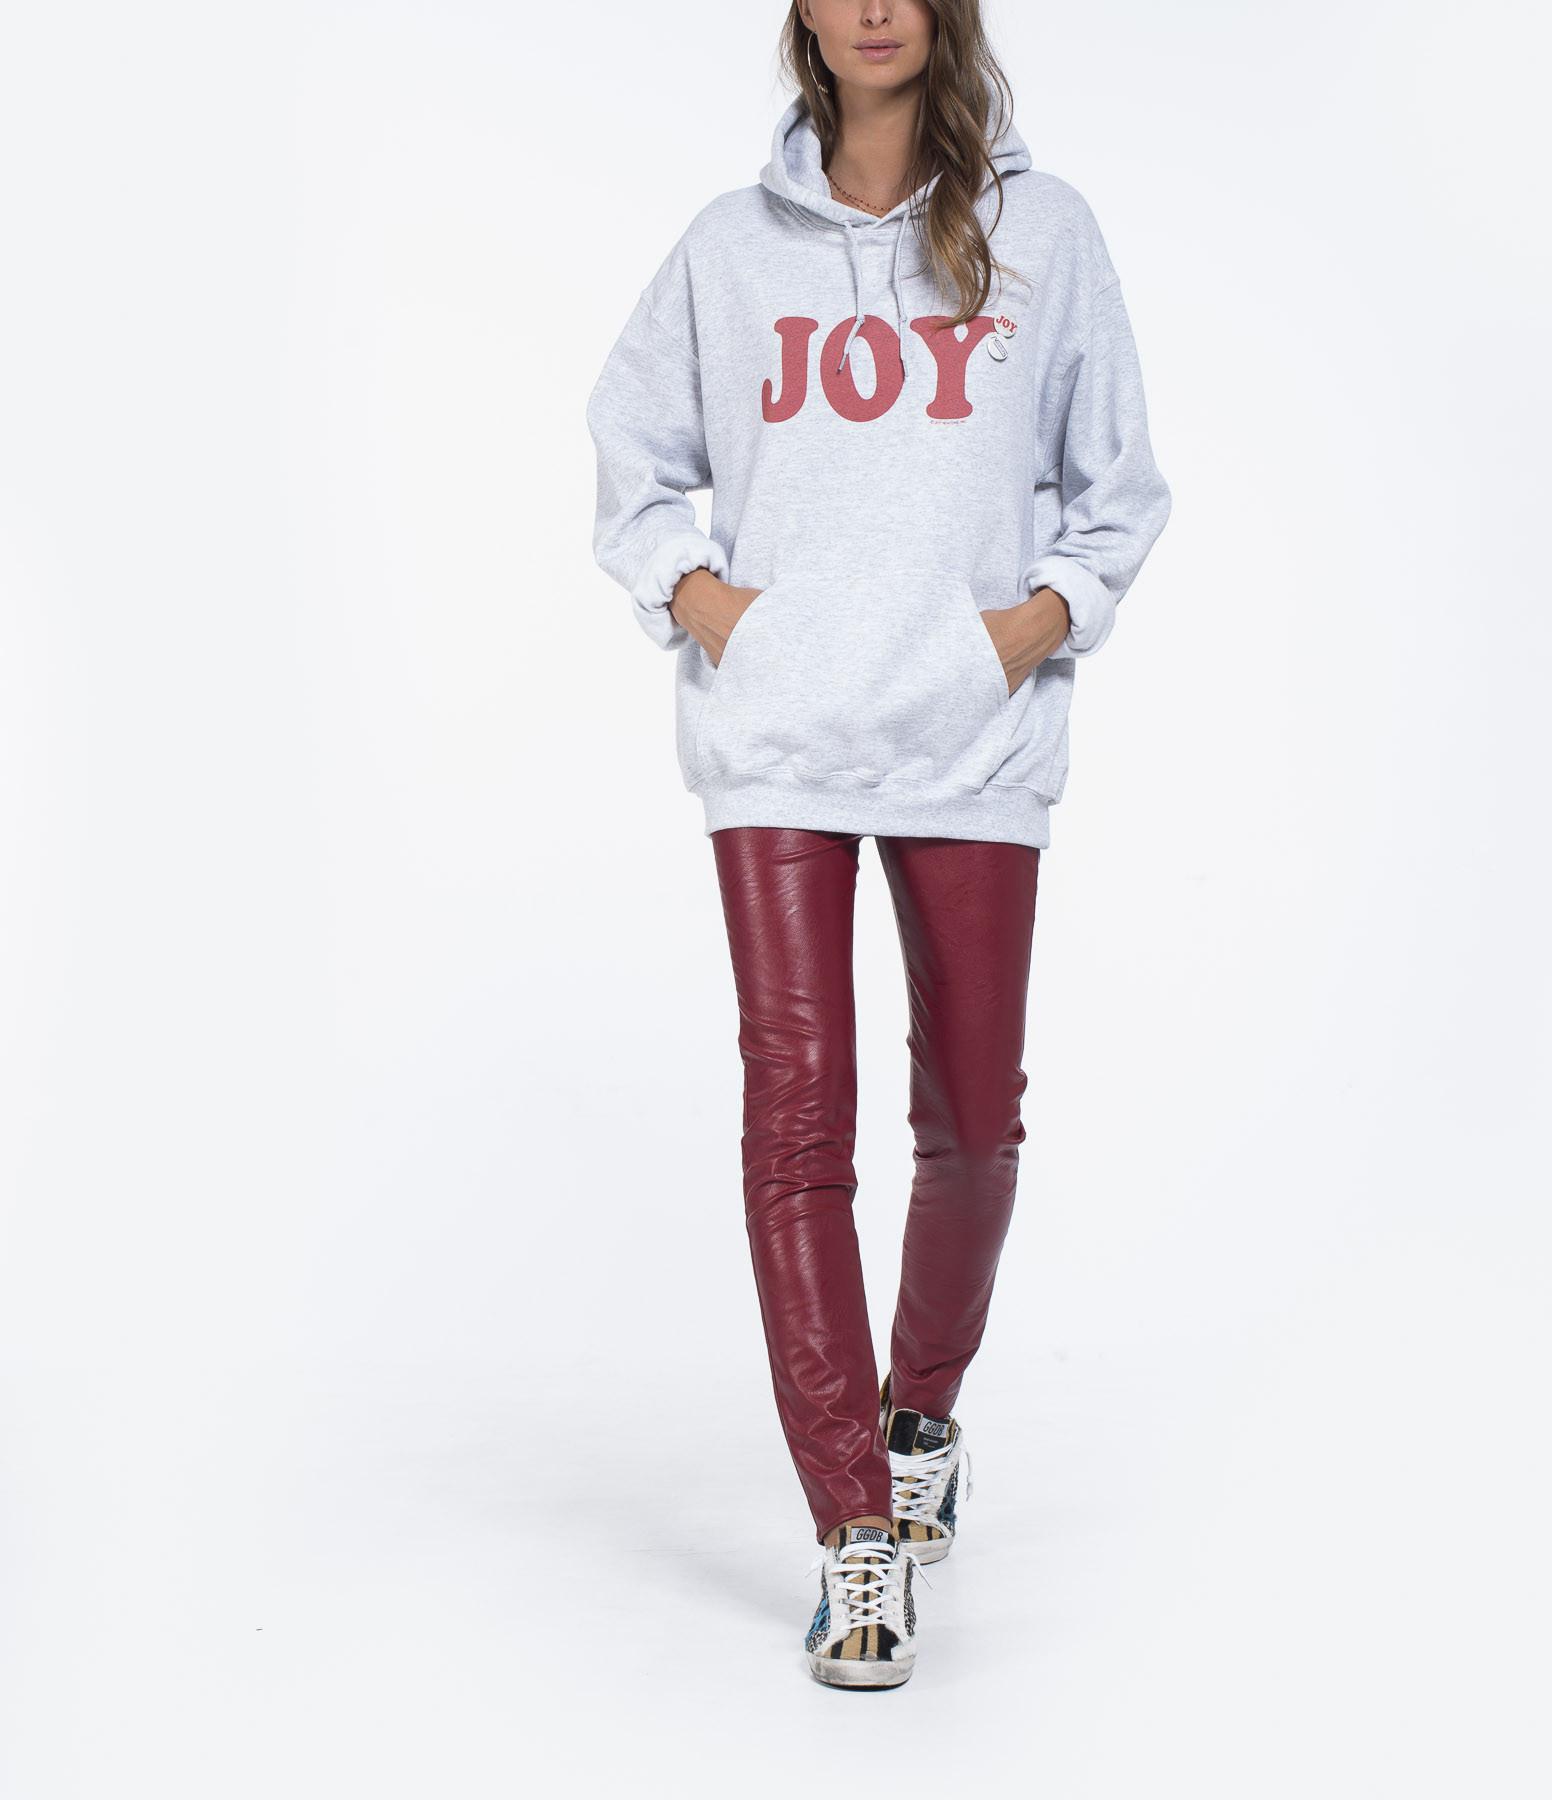 NEWTONE - Sweatshirt Capuche Joy Ash